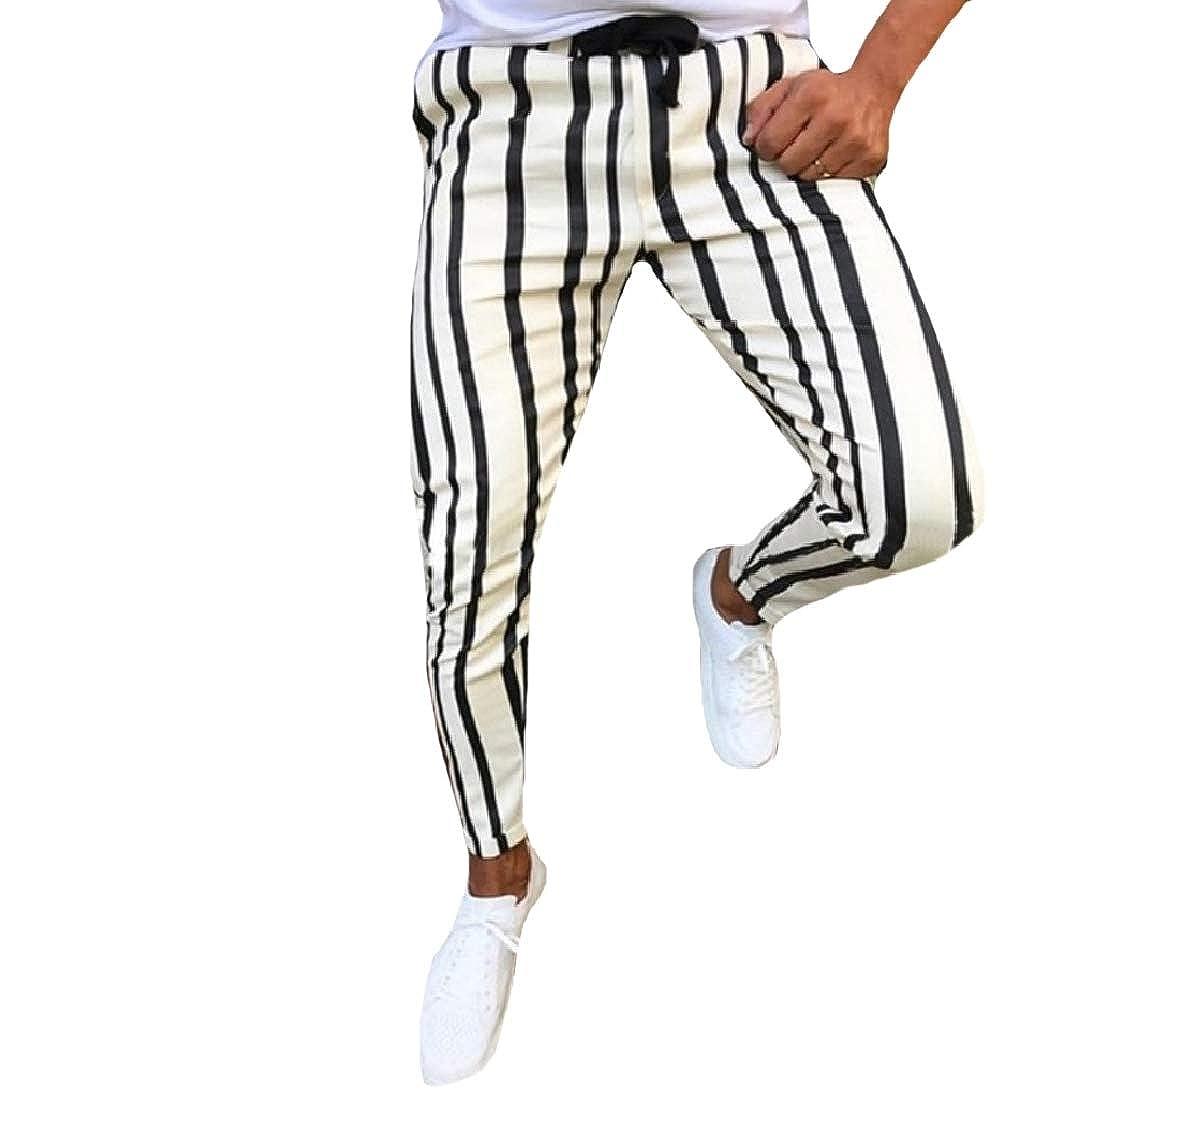 AngelSpace Mens Striped Slim Fit Fashion Elastic Waist Harem Tenths Pants